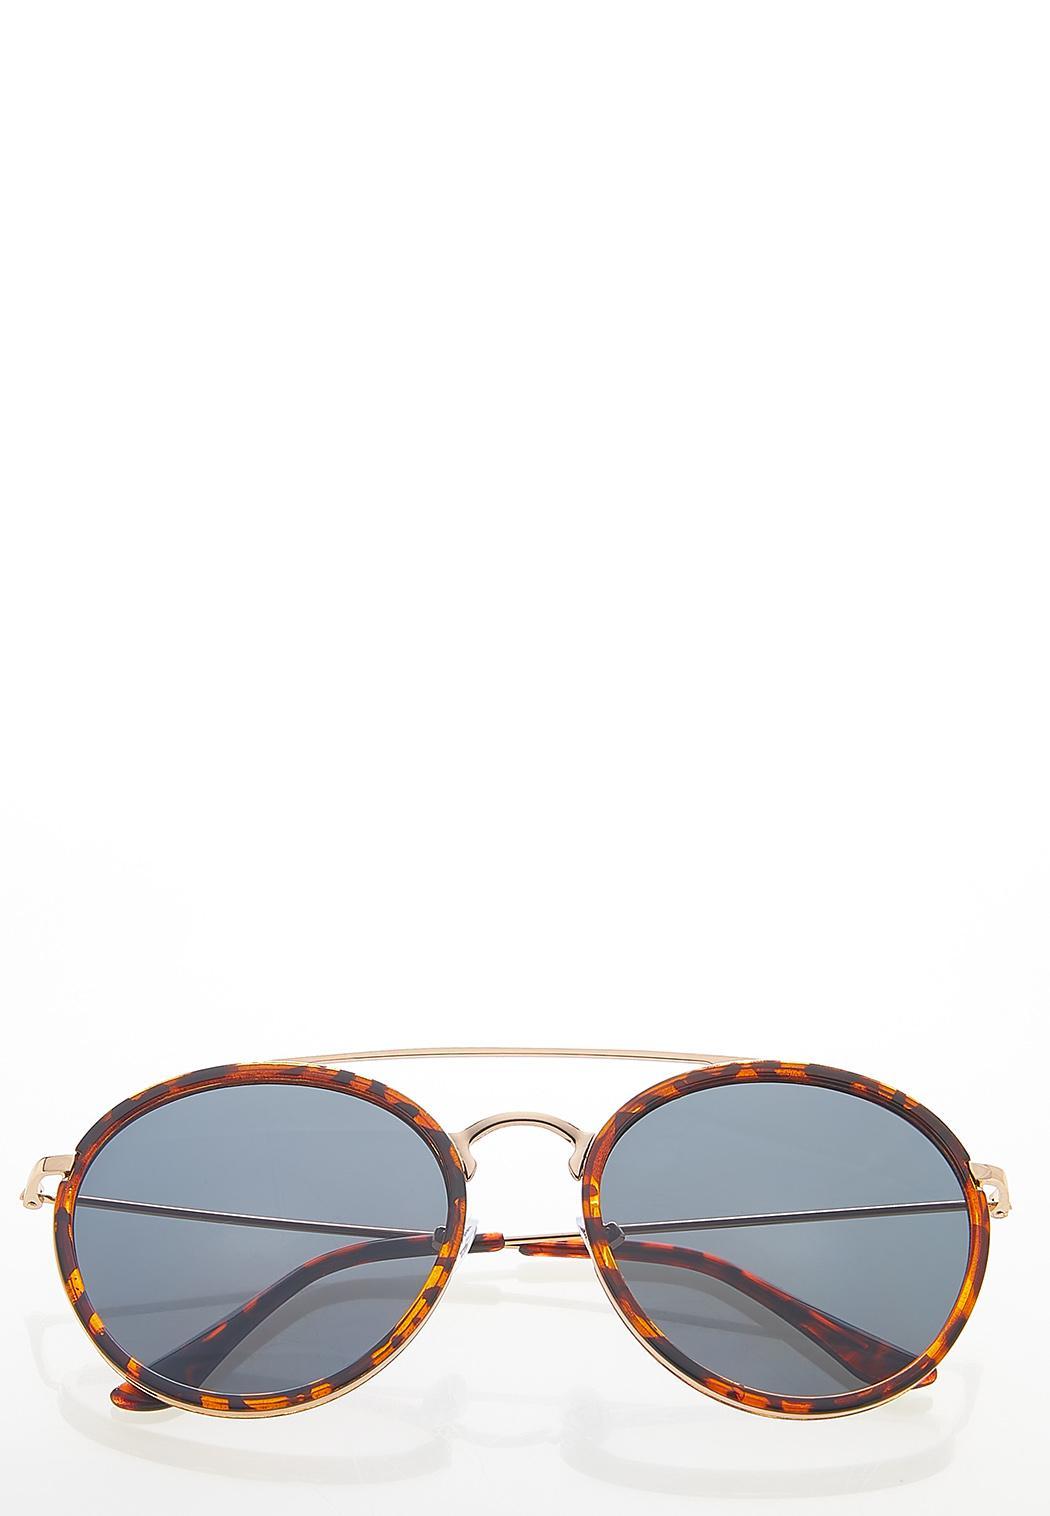 Tort Trim Round Sunglasses